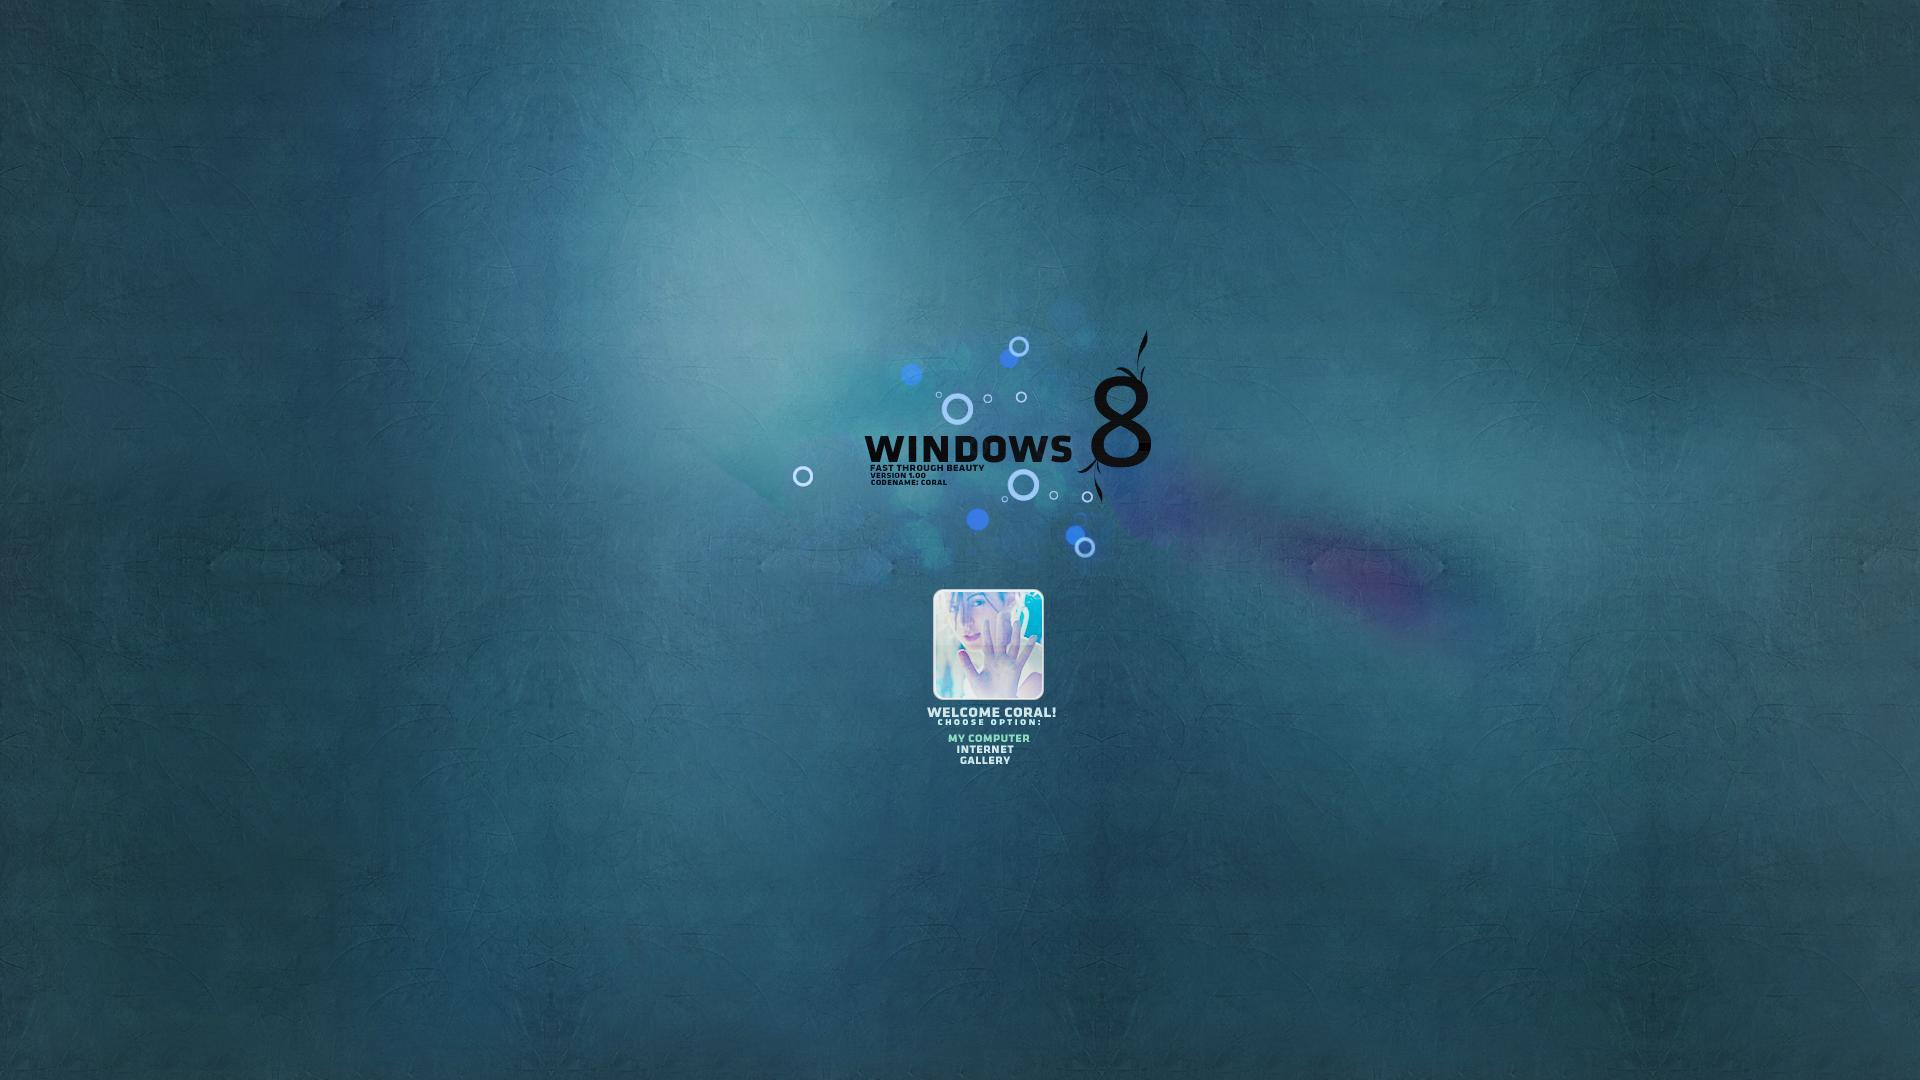 Win8真的要来了26张高清壁纸抢先体验 科技频道 凤凰网